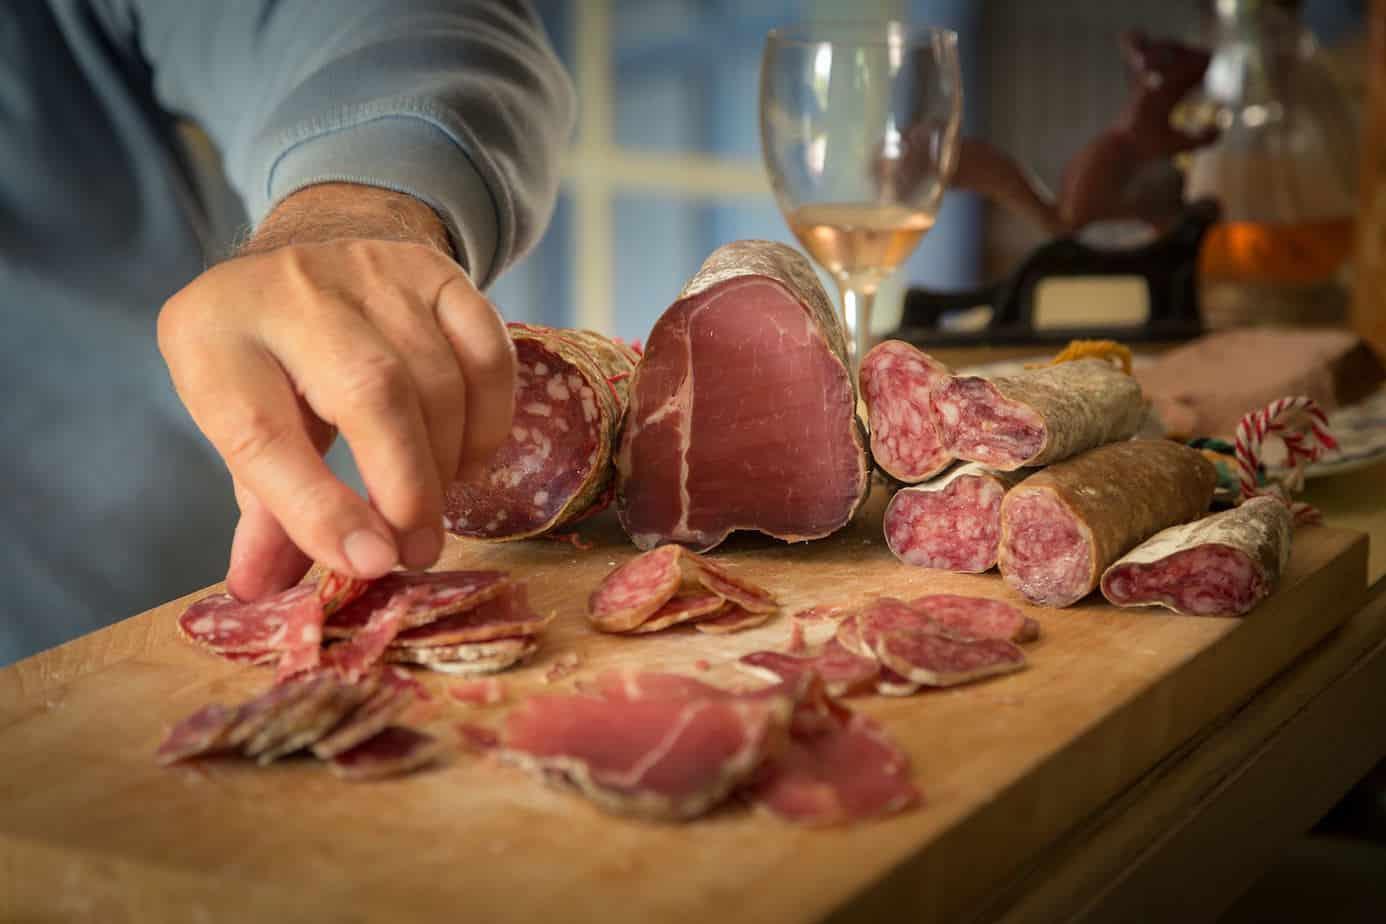 Salami getting sliced